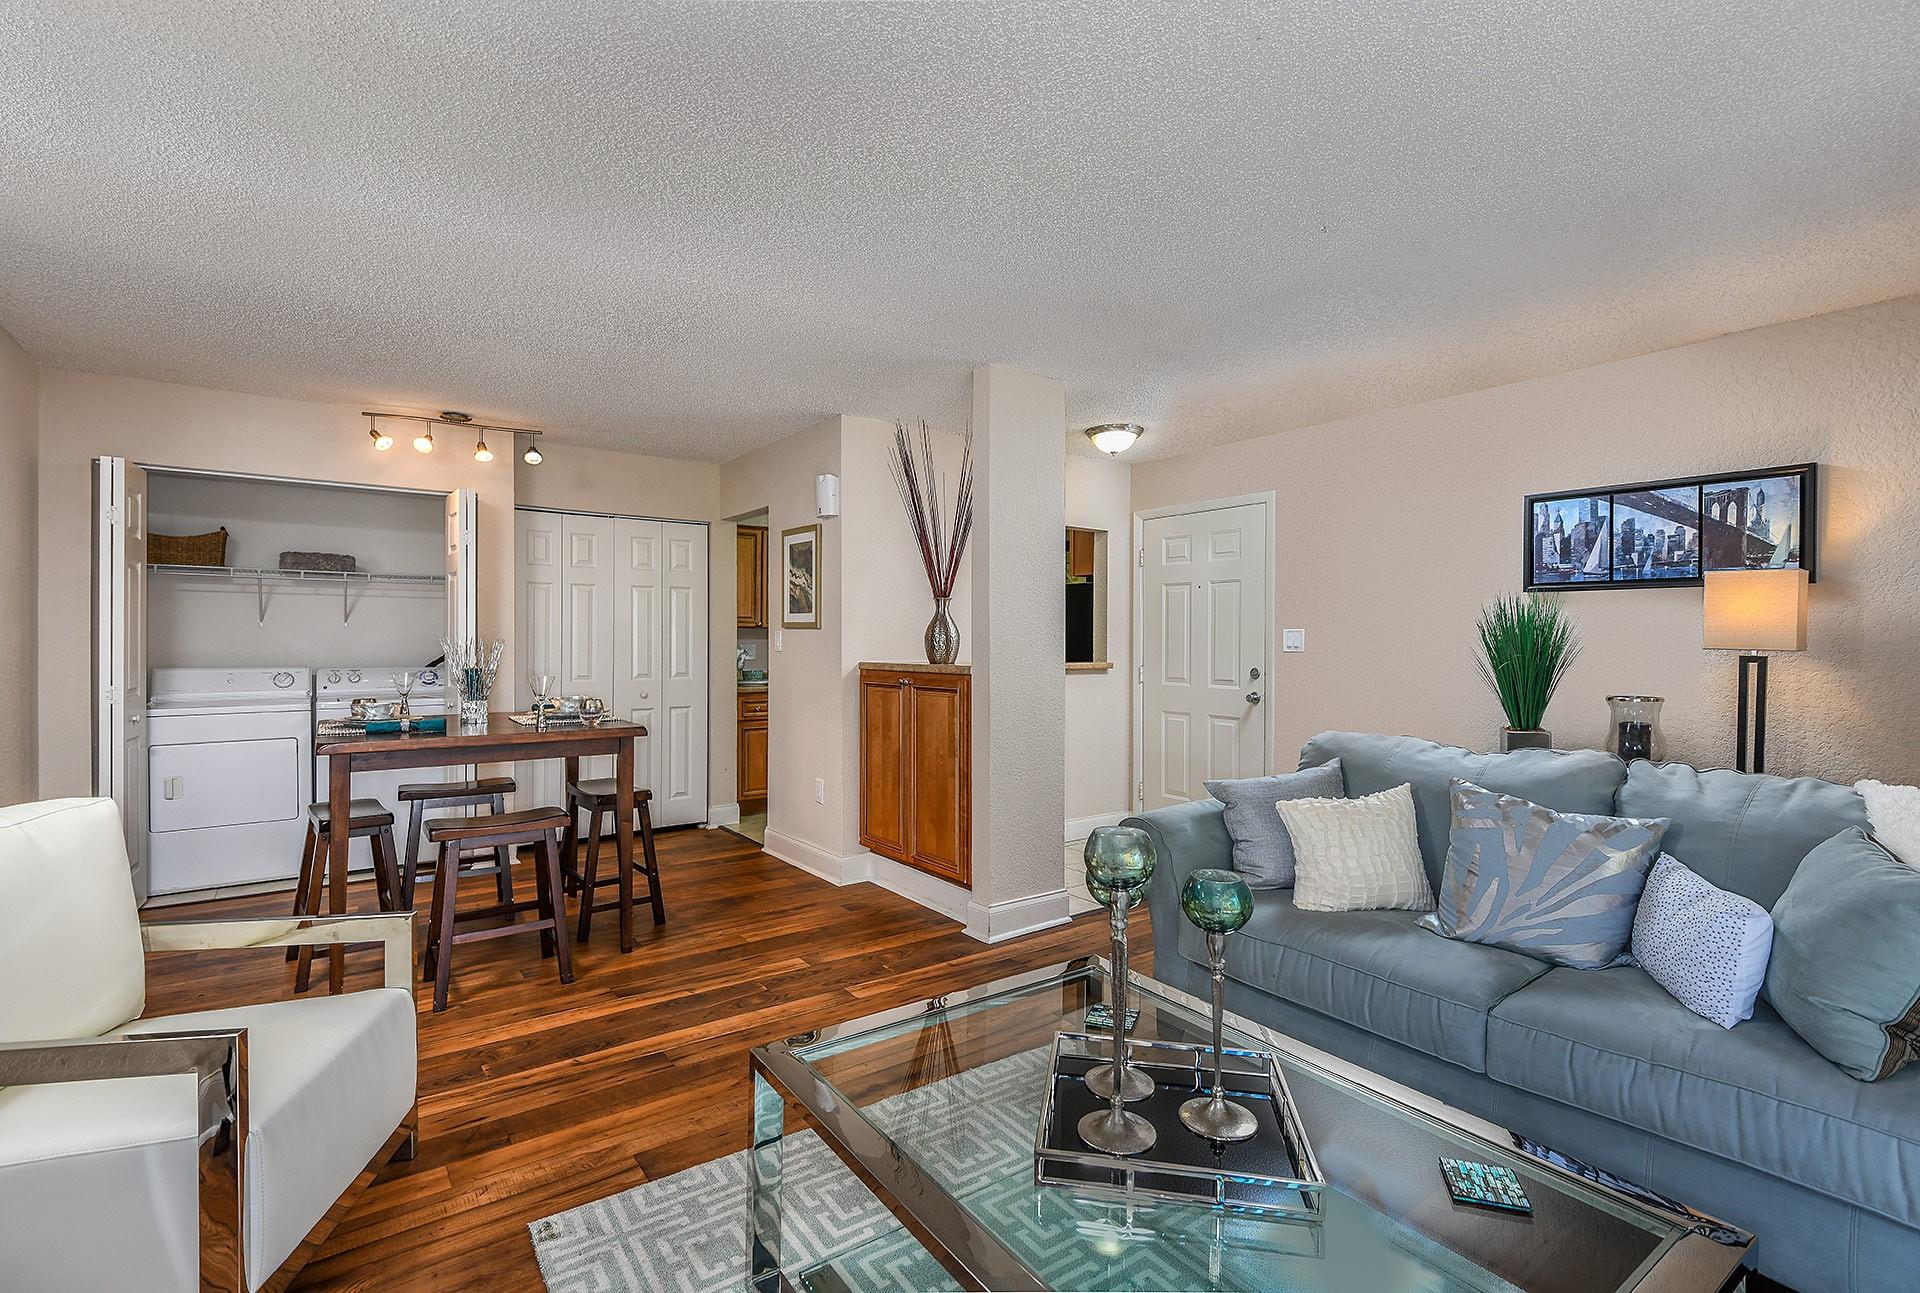 Summerlin at Winter Park Apartments rental